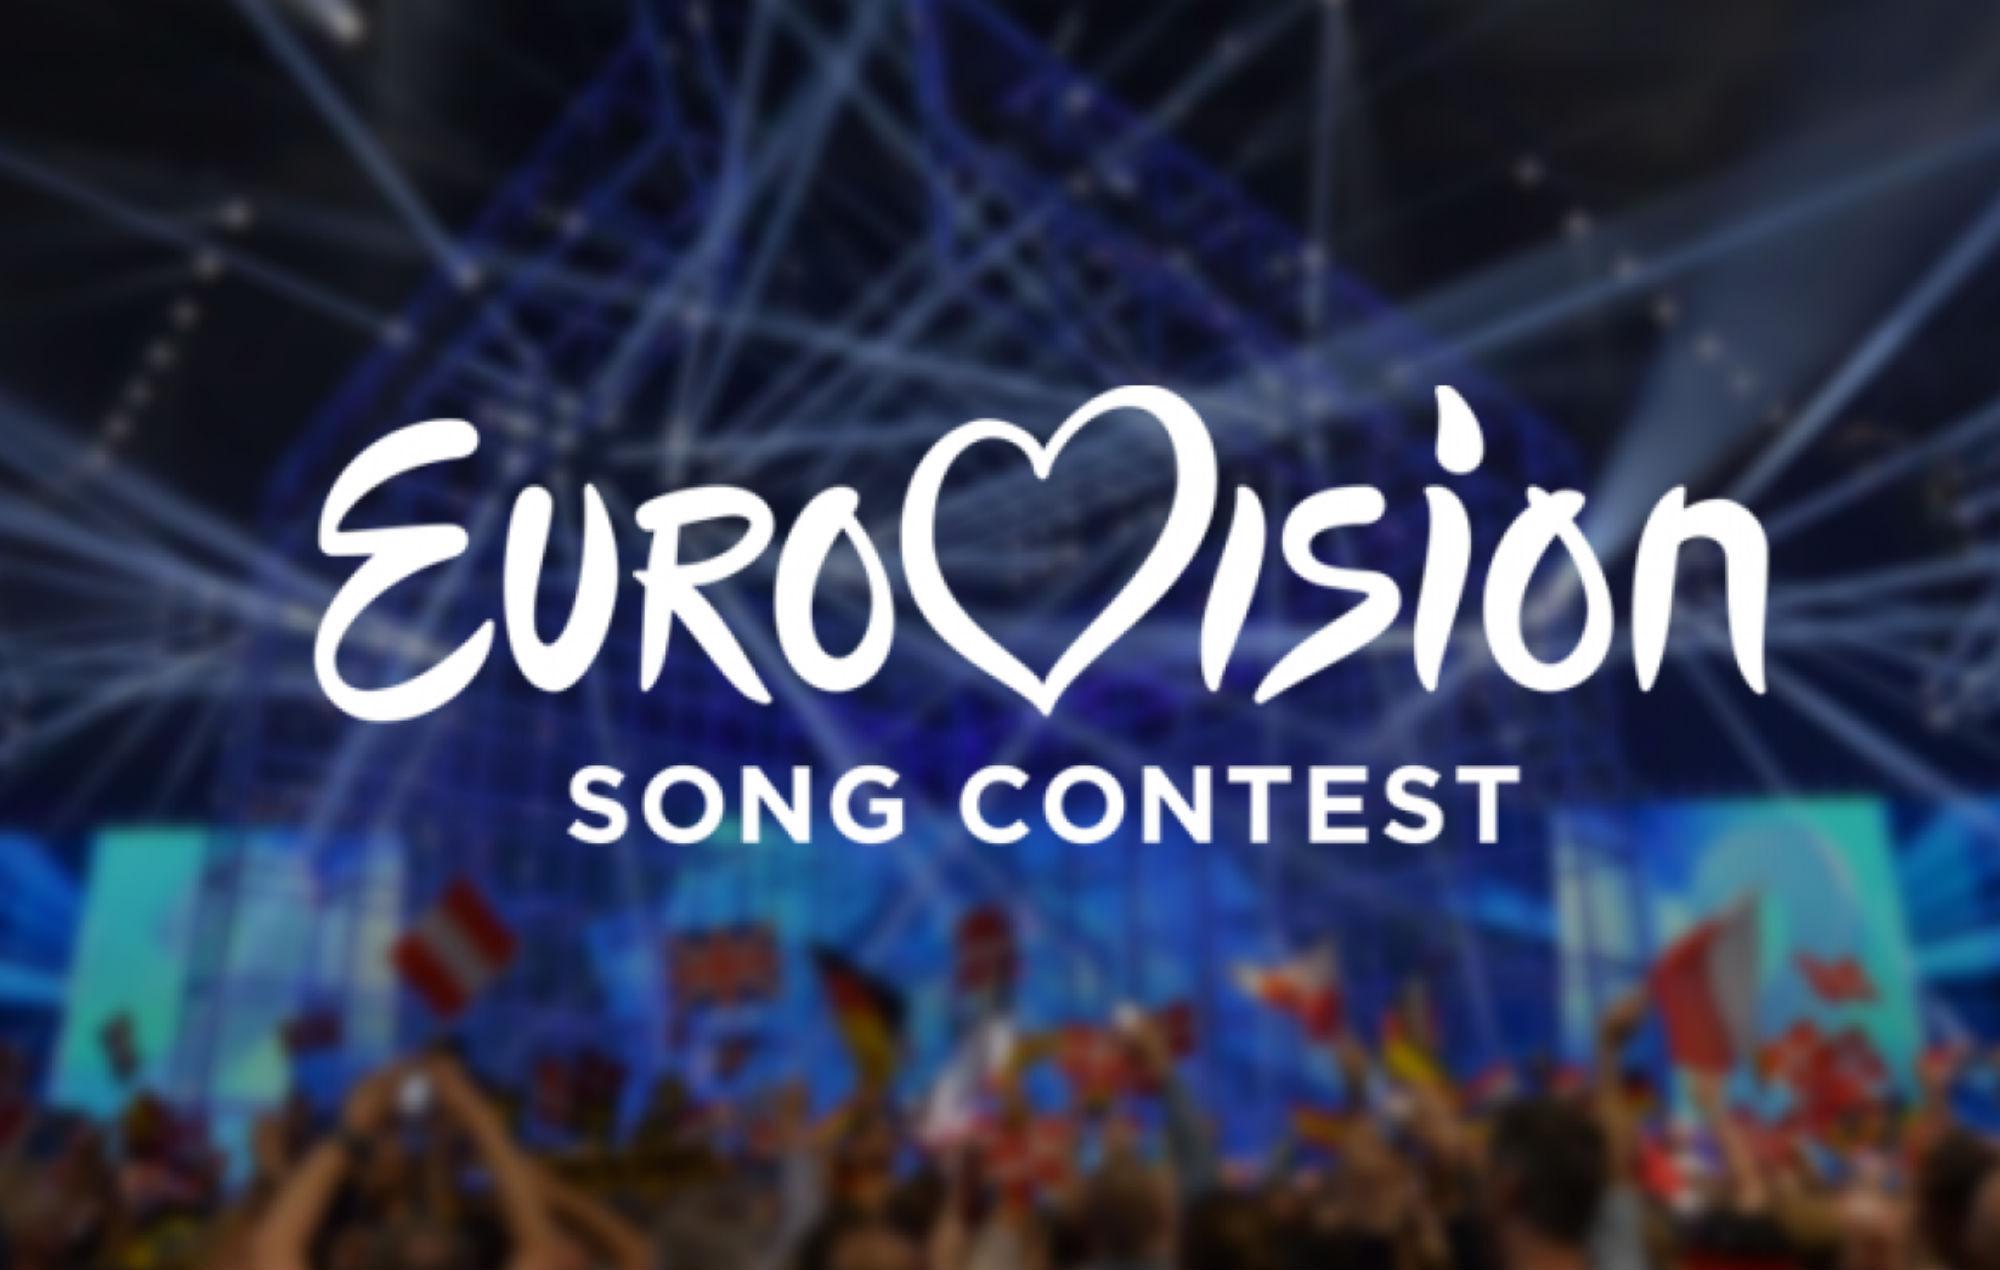 Öğrenci Kariyeri - Kültür & Sanat: Nerede O Eski Eurovision'lar?